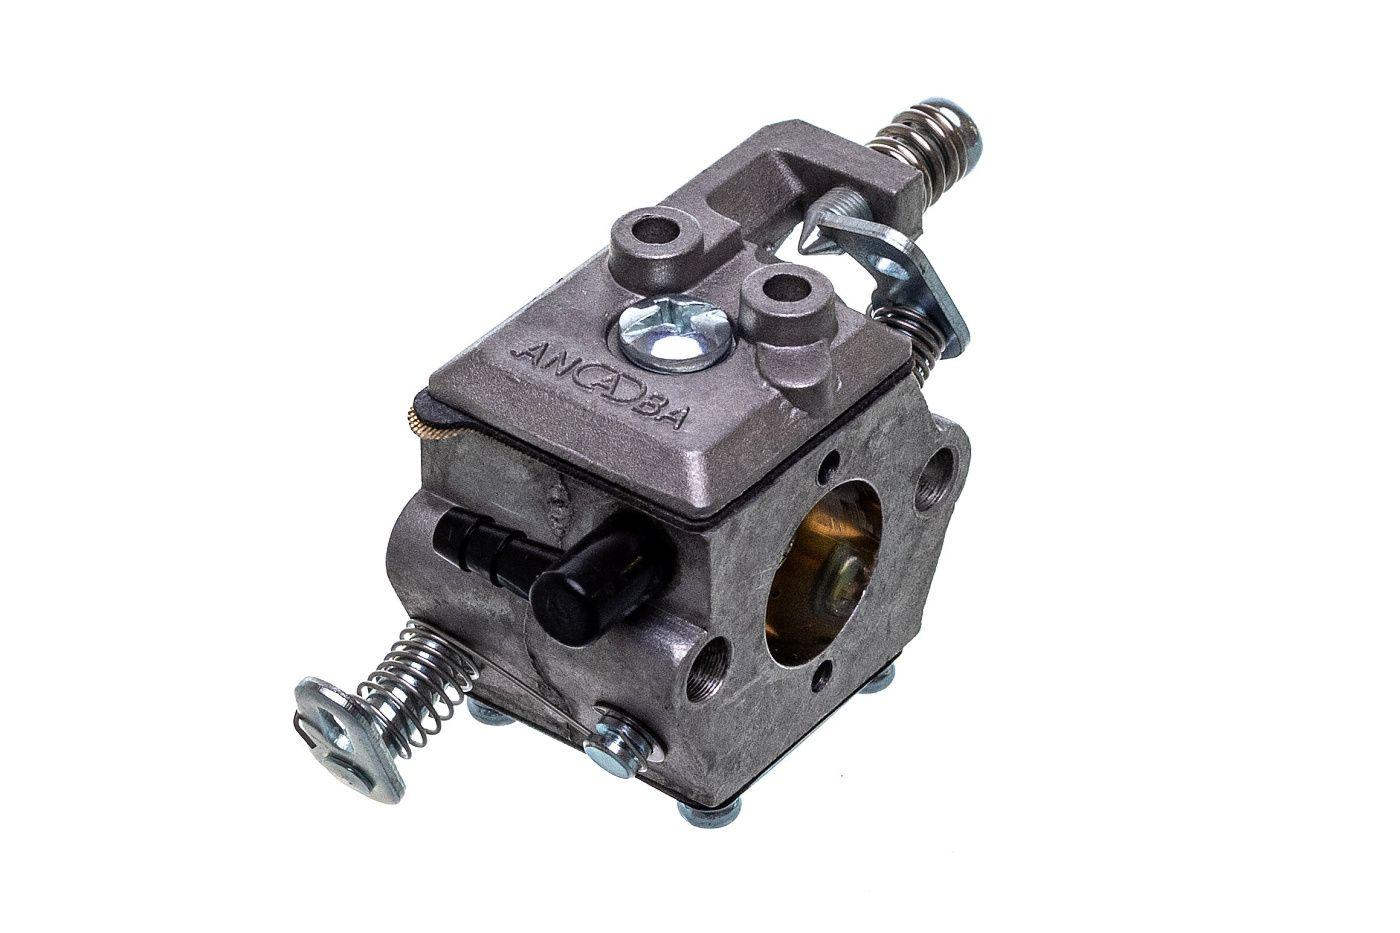 Karburátor Stihl MS170 MS180 017 018 C1Q-S152E (1130 120 0608)